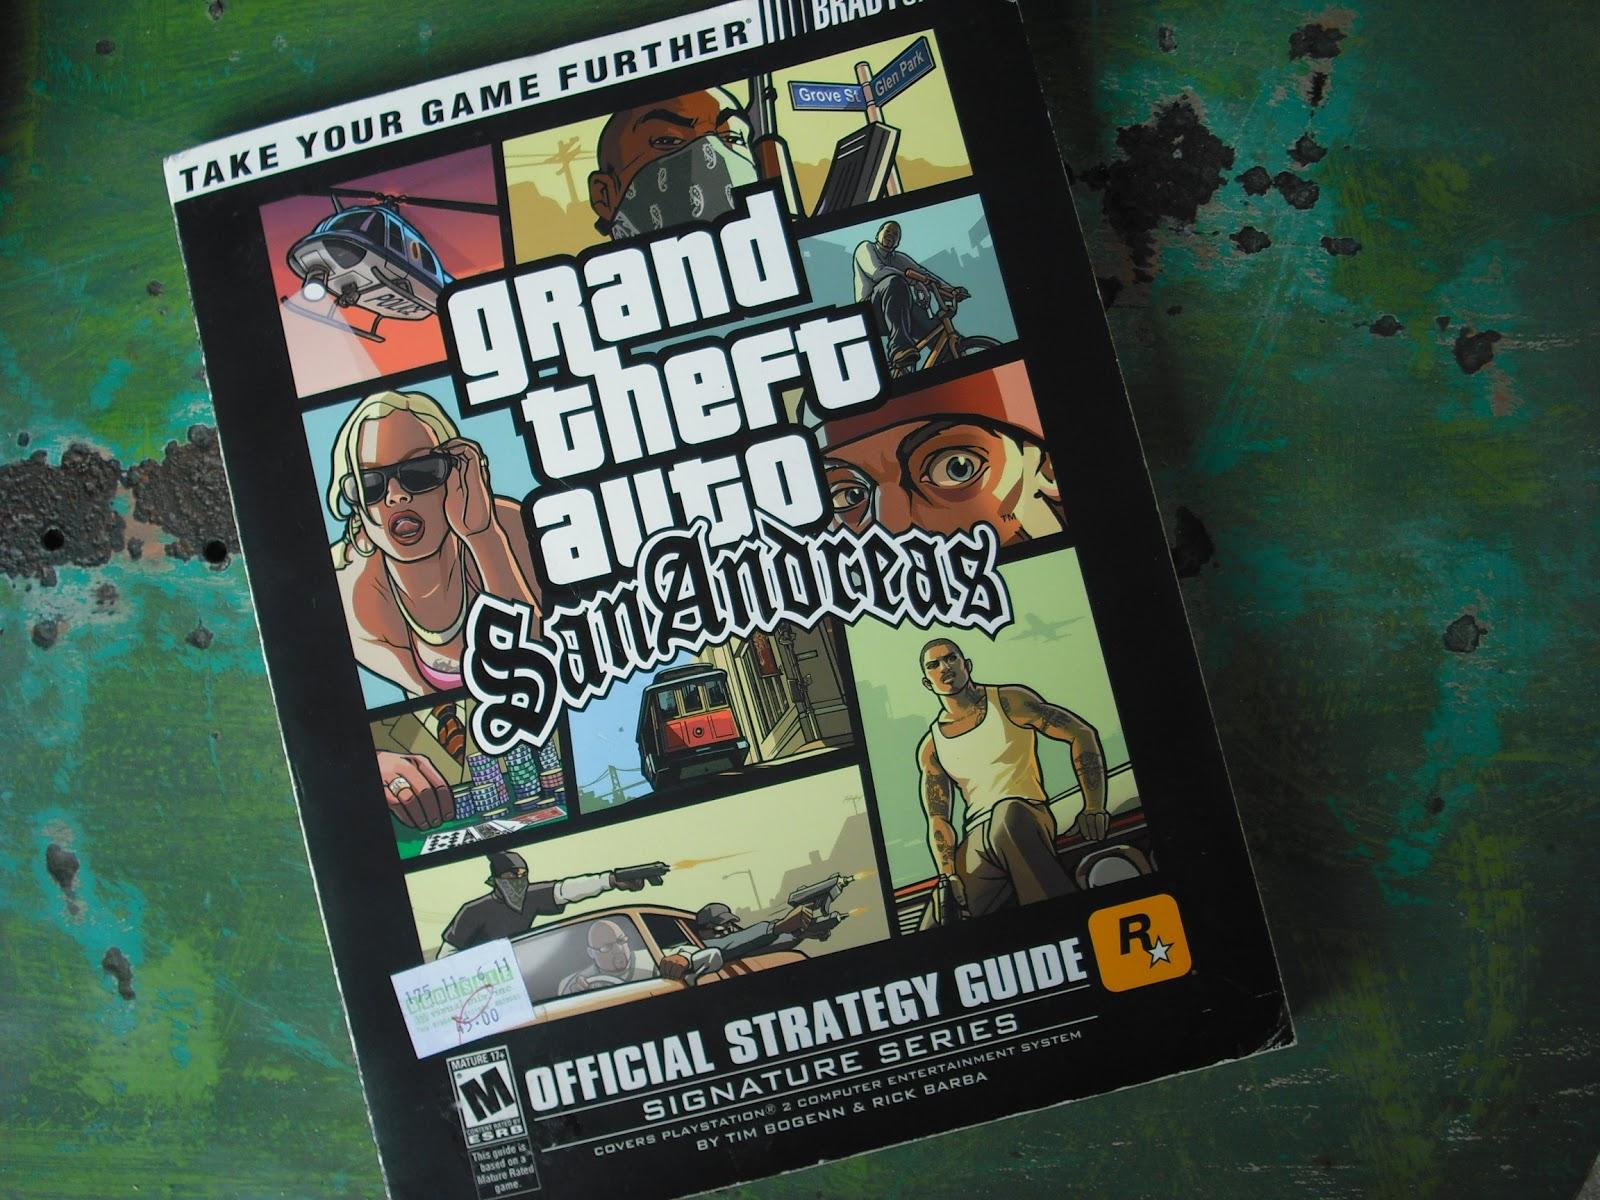 GTA+San+Andreas+Strategy+Guide+by+Brady+